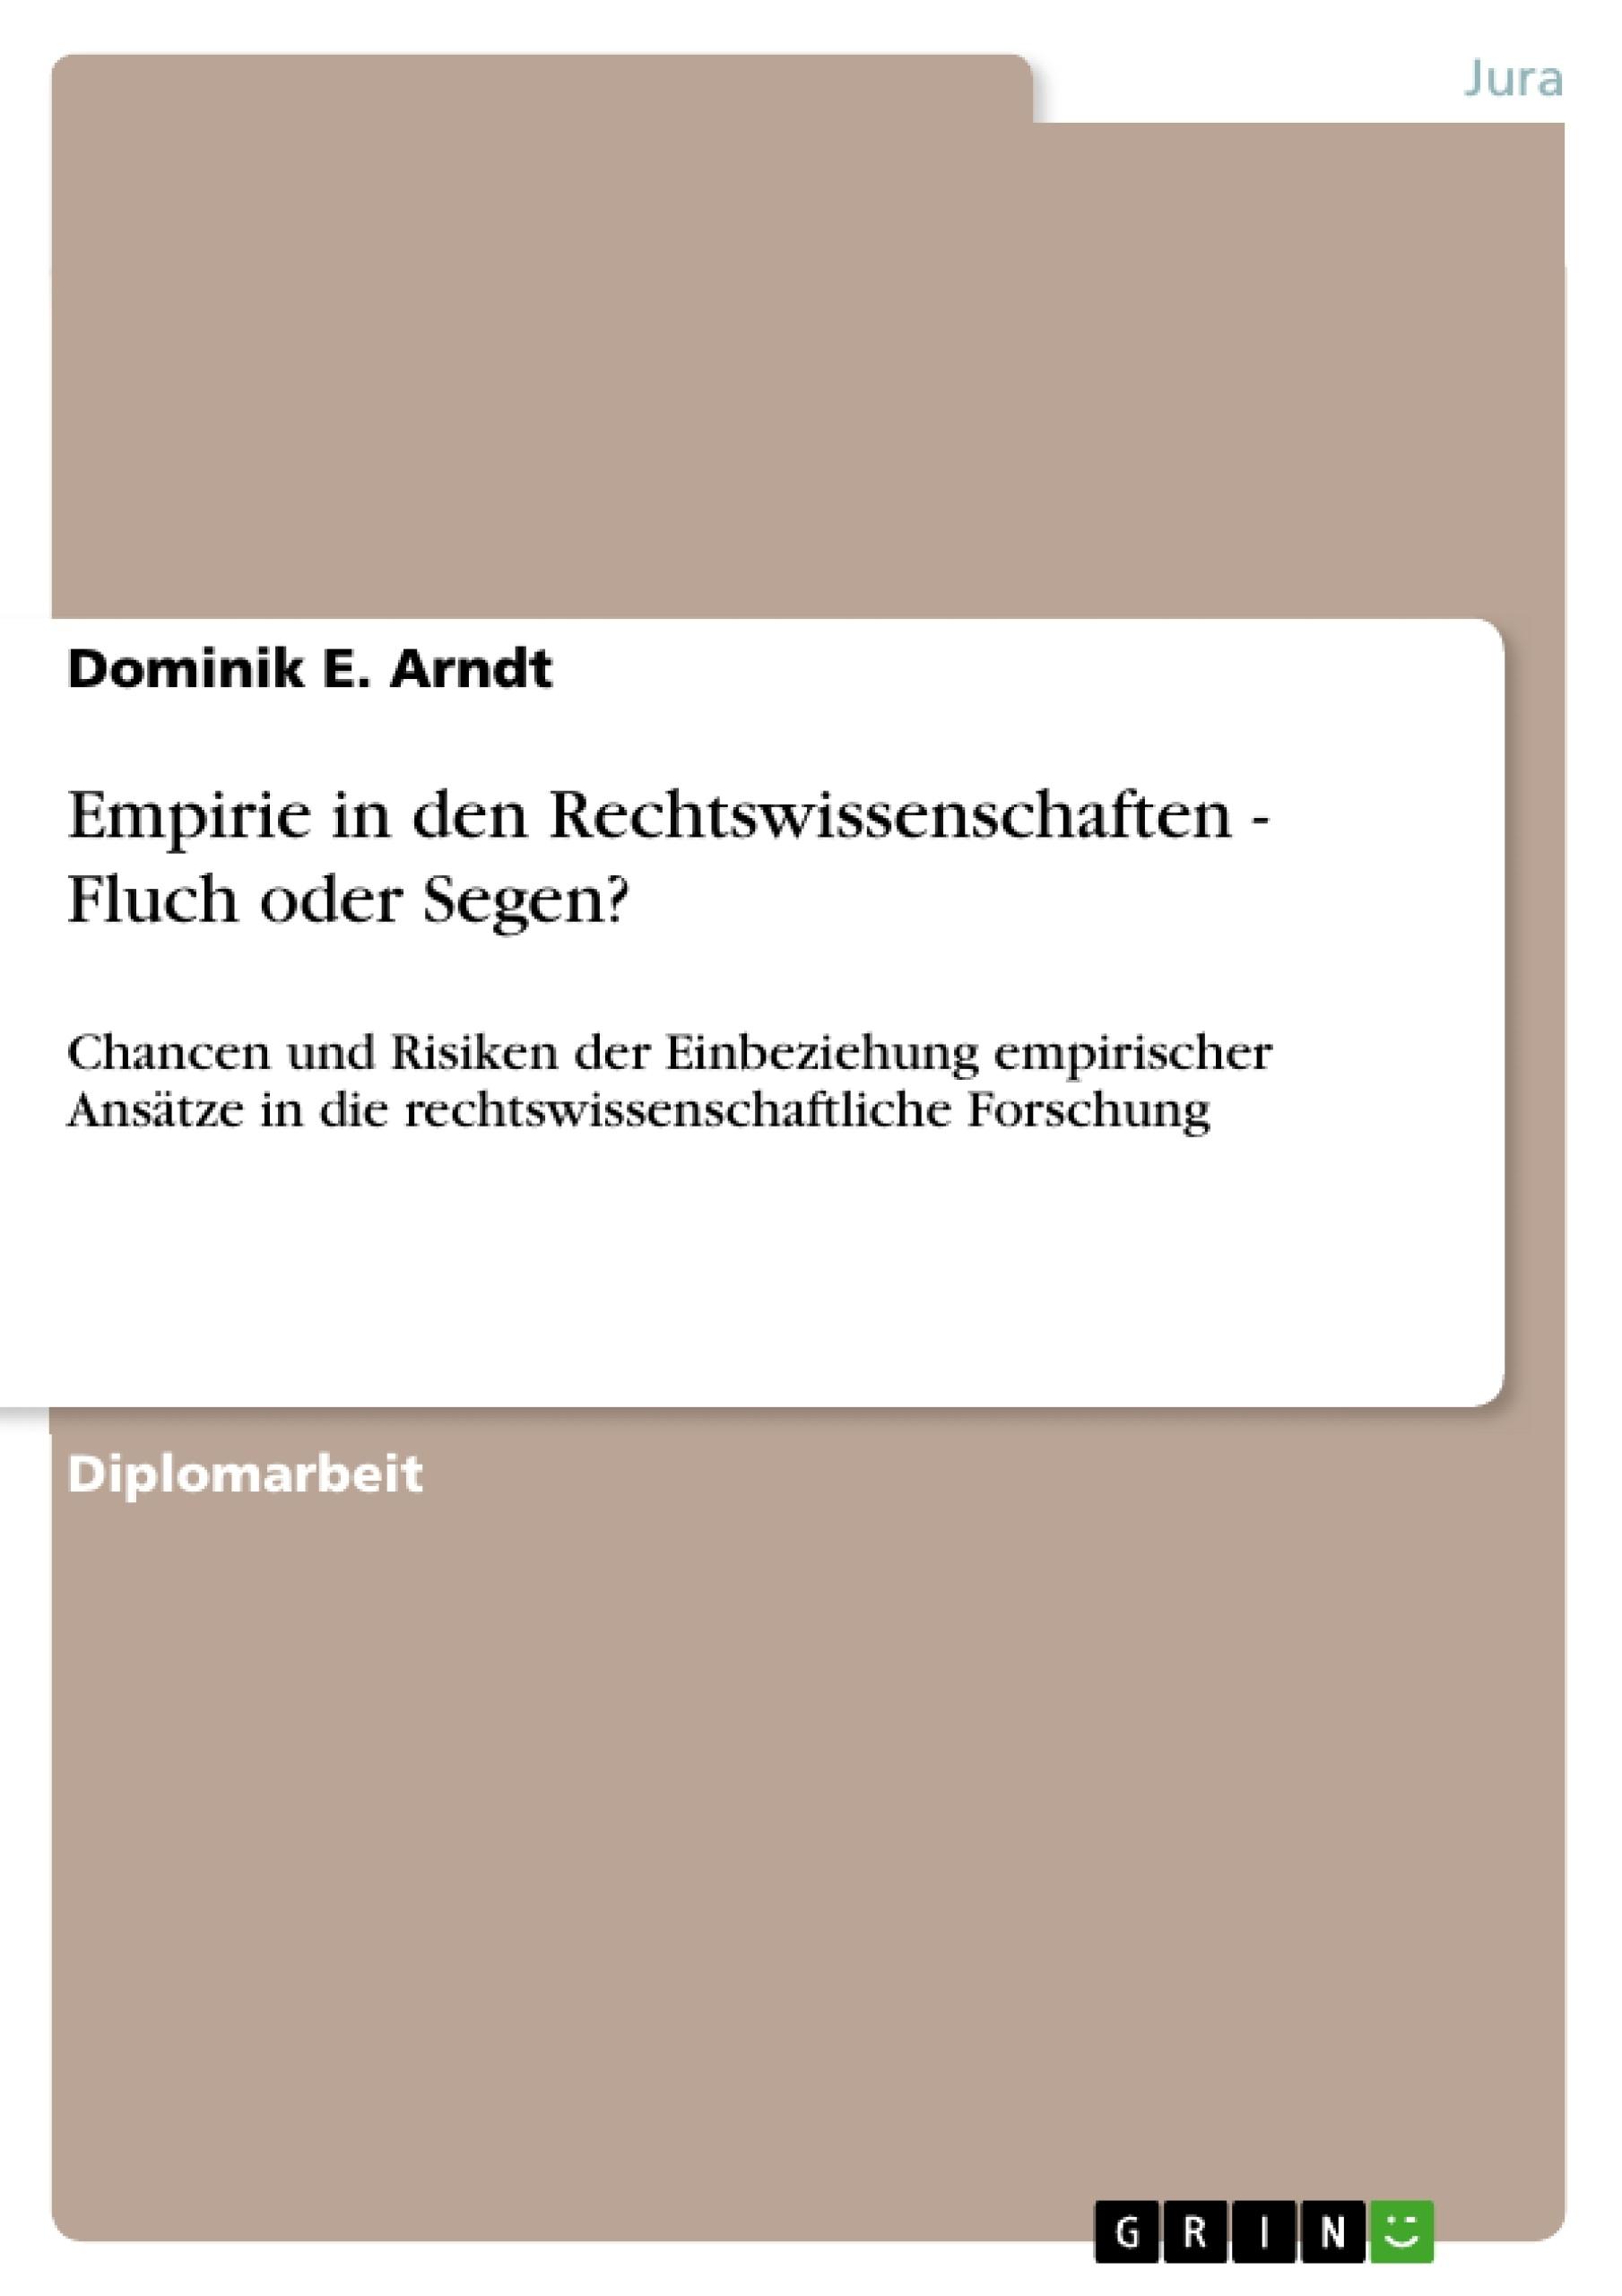 Titel: Empirie in den Rechtswissenschaften - Fluch oder Segen?